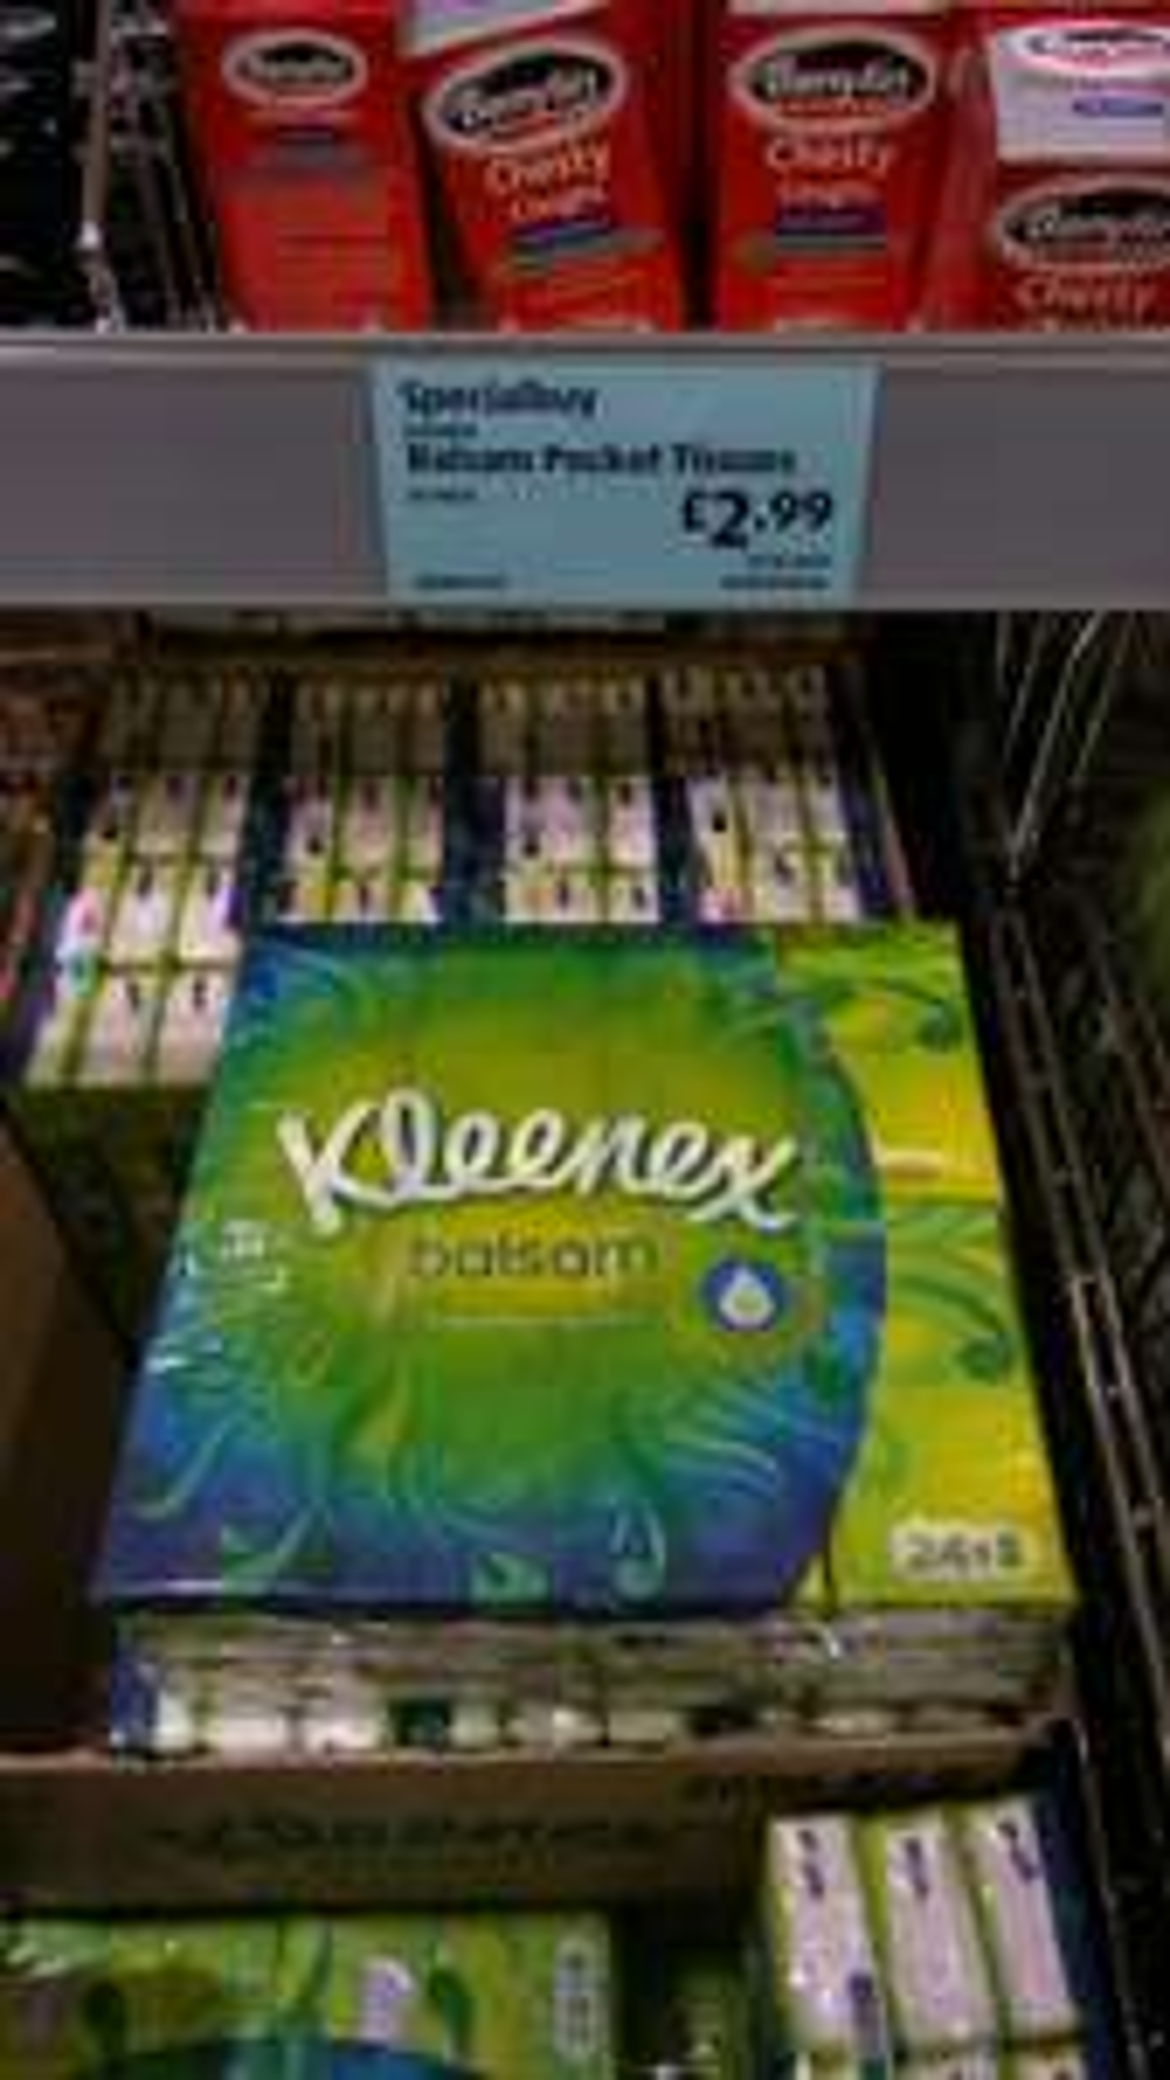 Kleenex balsam 24 pack tissues £2.99 ALDI